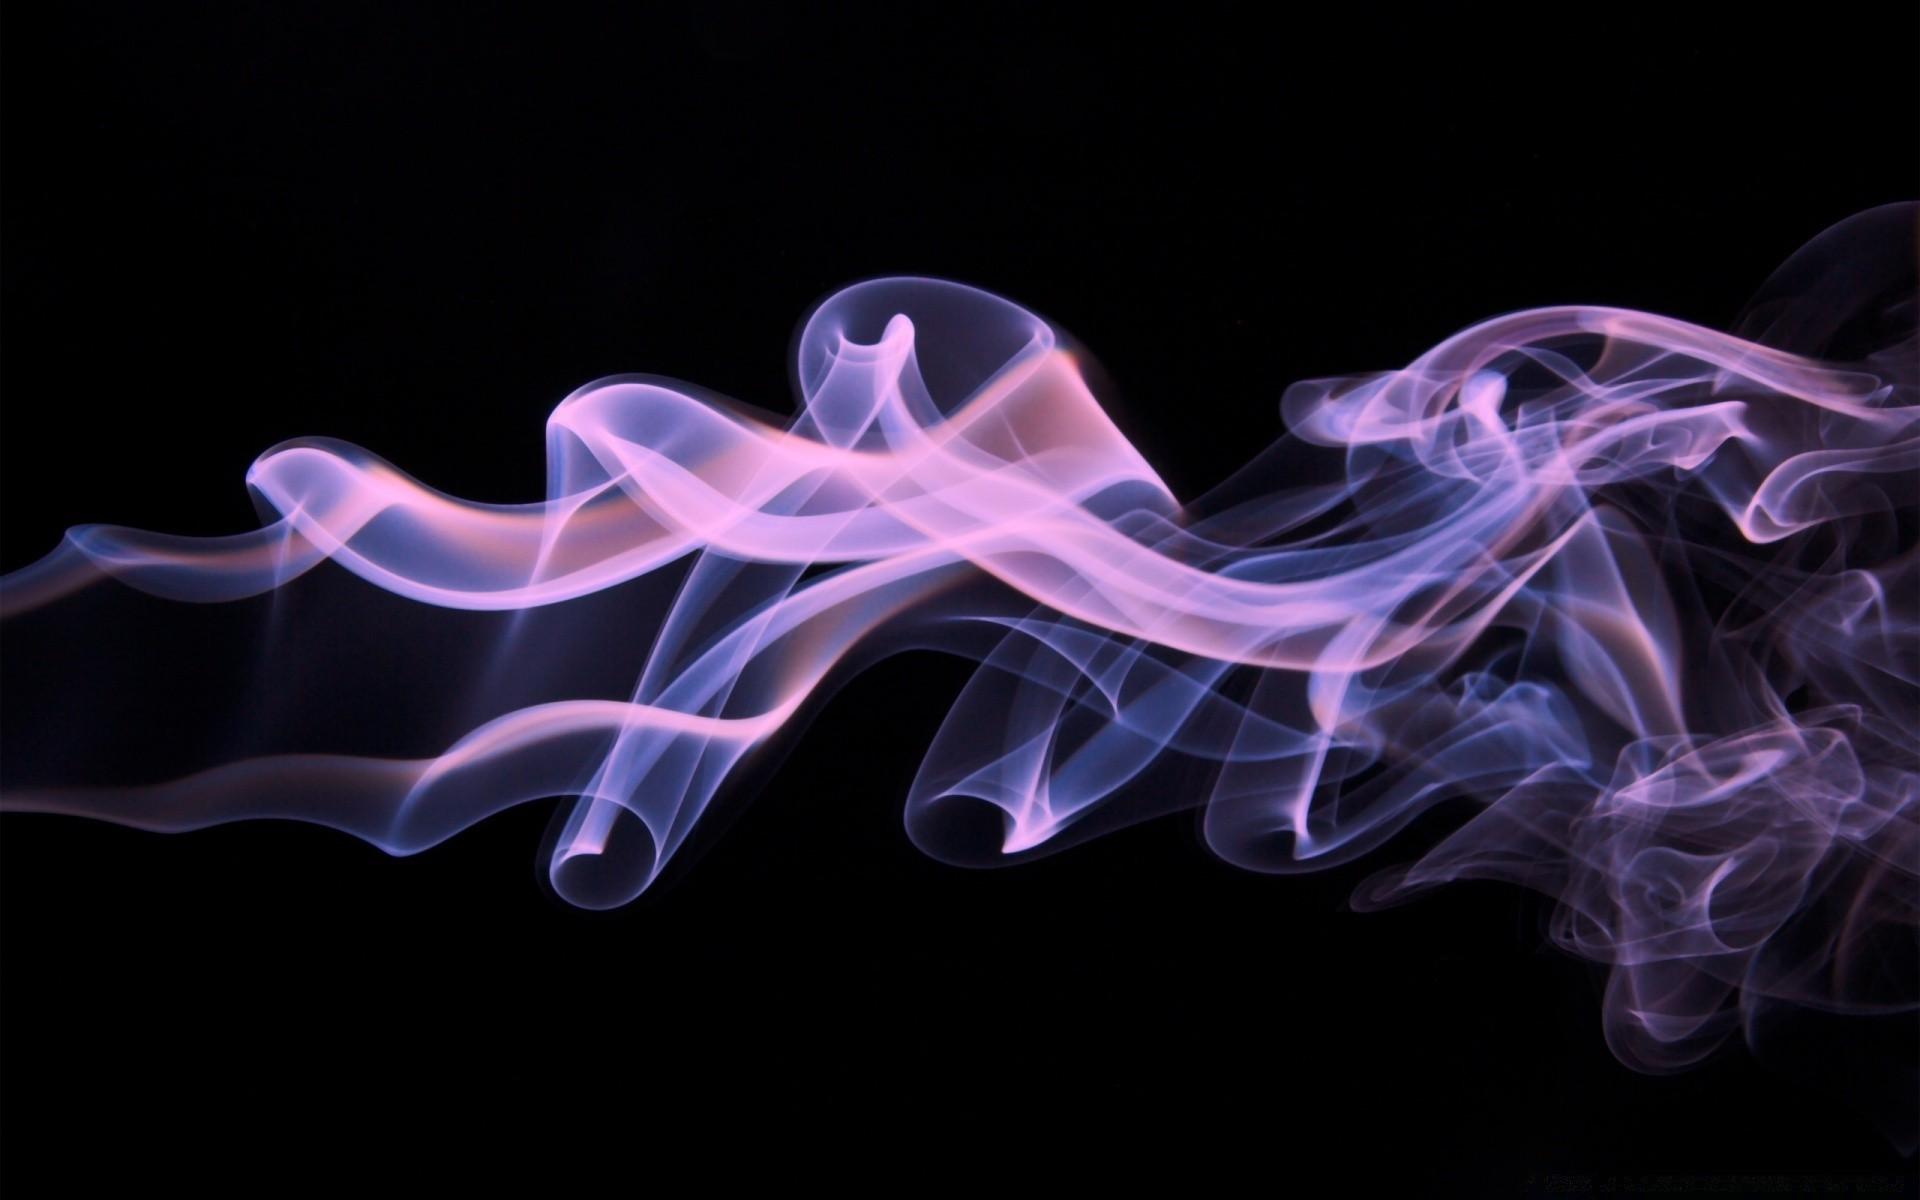 Картинка на рабочий дым